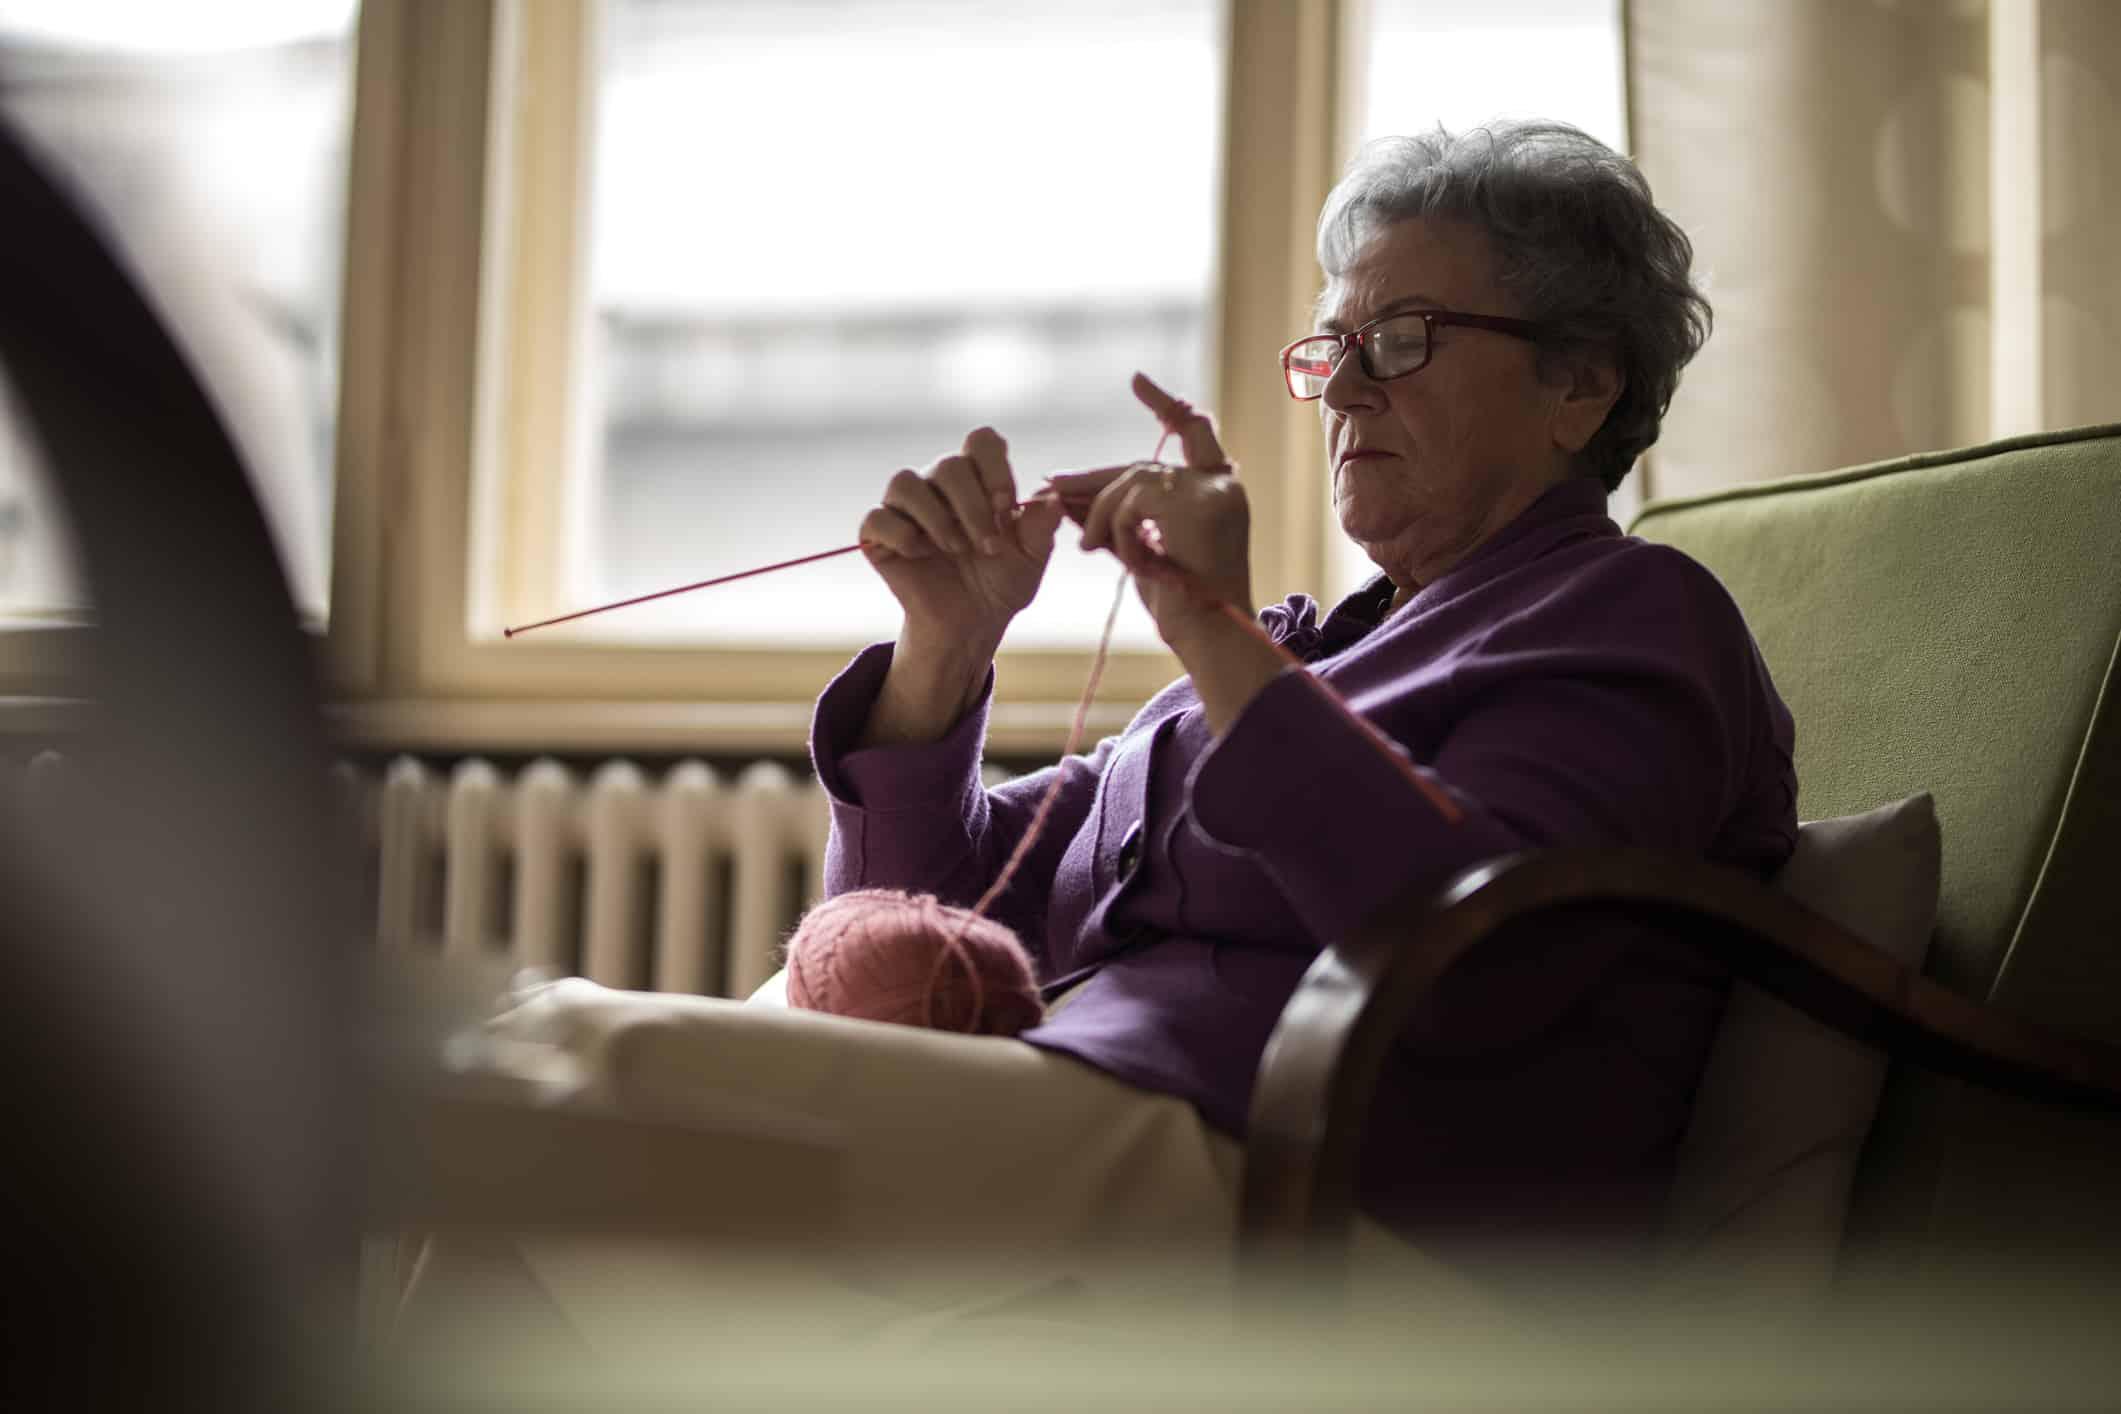 Senior women sitting at home and knitting near window.